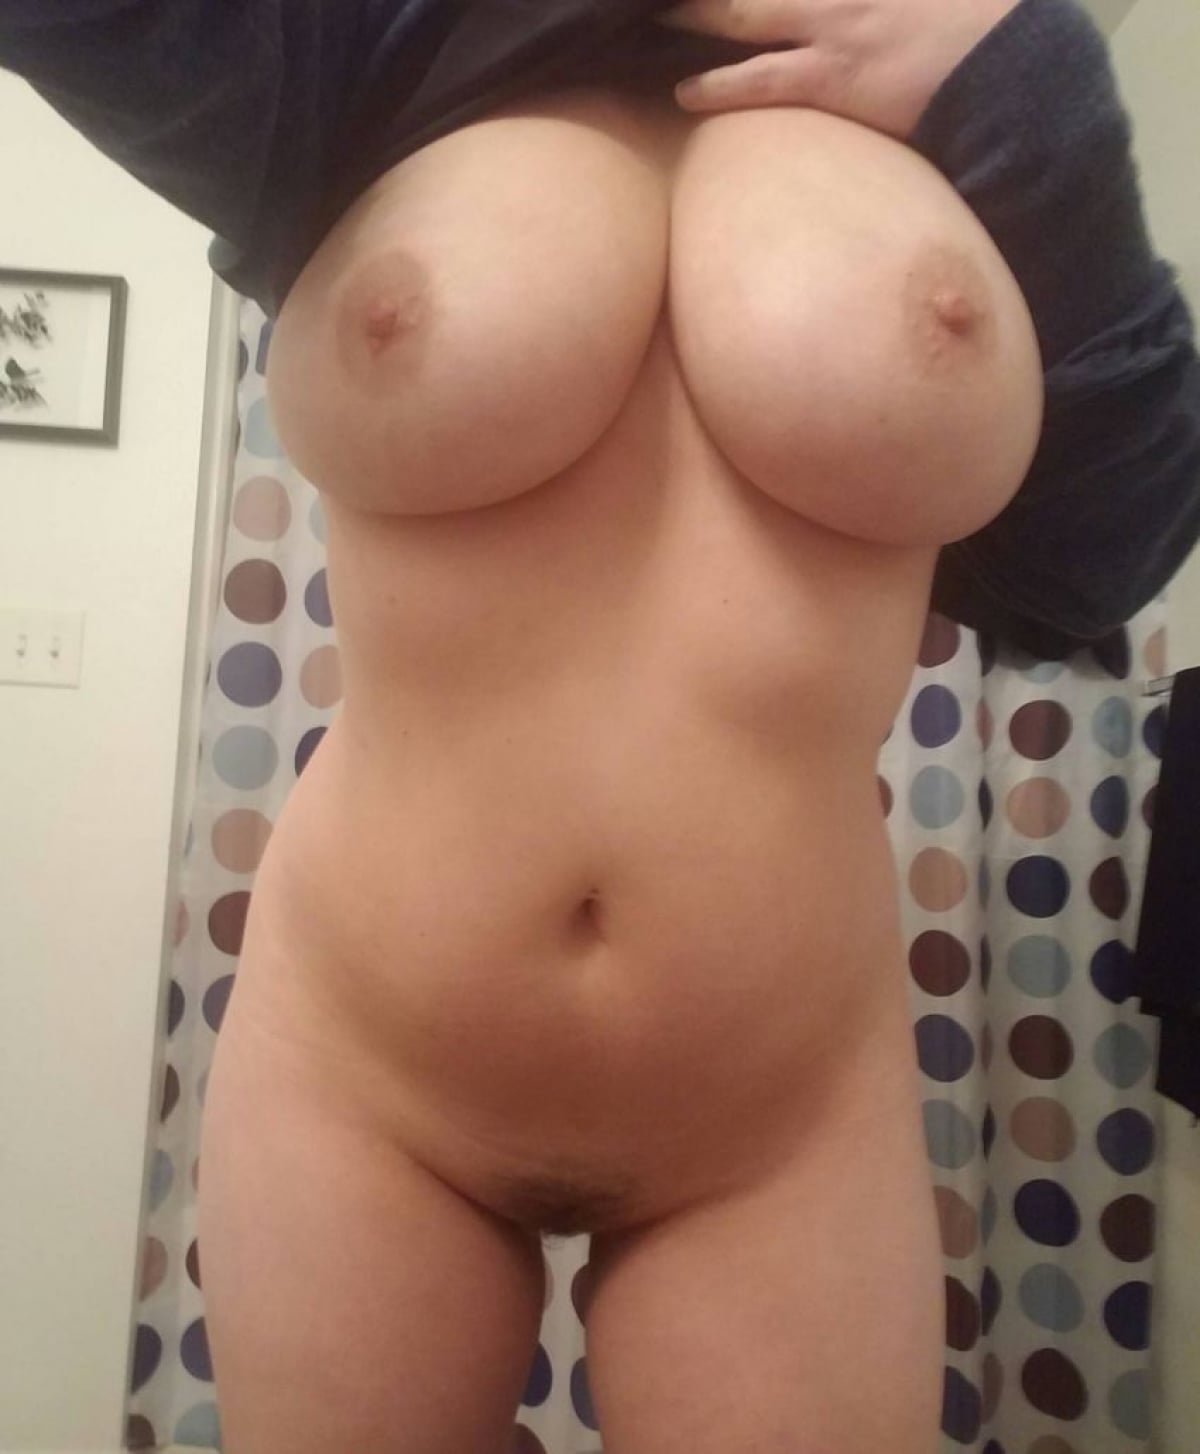 https://sexyna.org/wp-content/uploads/2019/08/Nahaté-selfie-amatérek-59.jpg